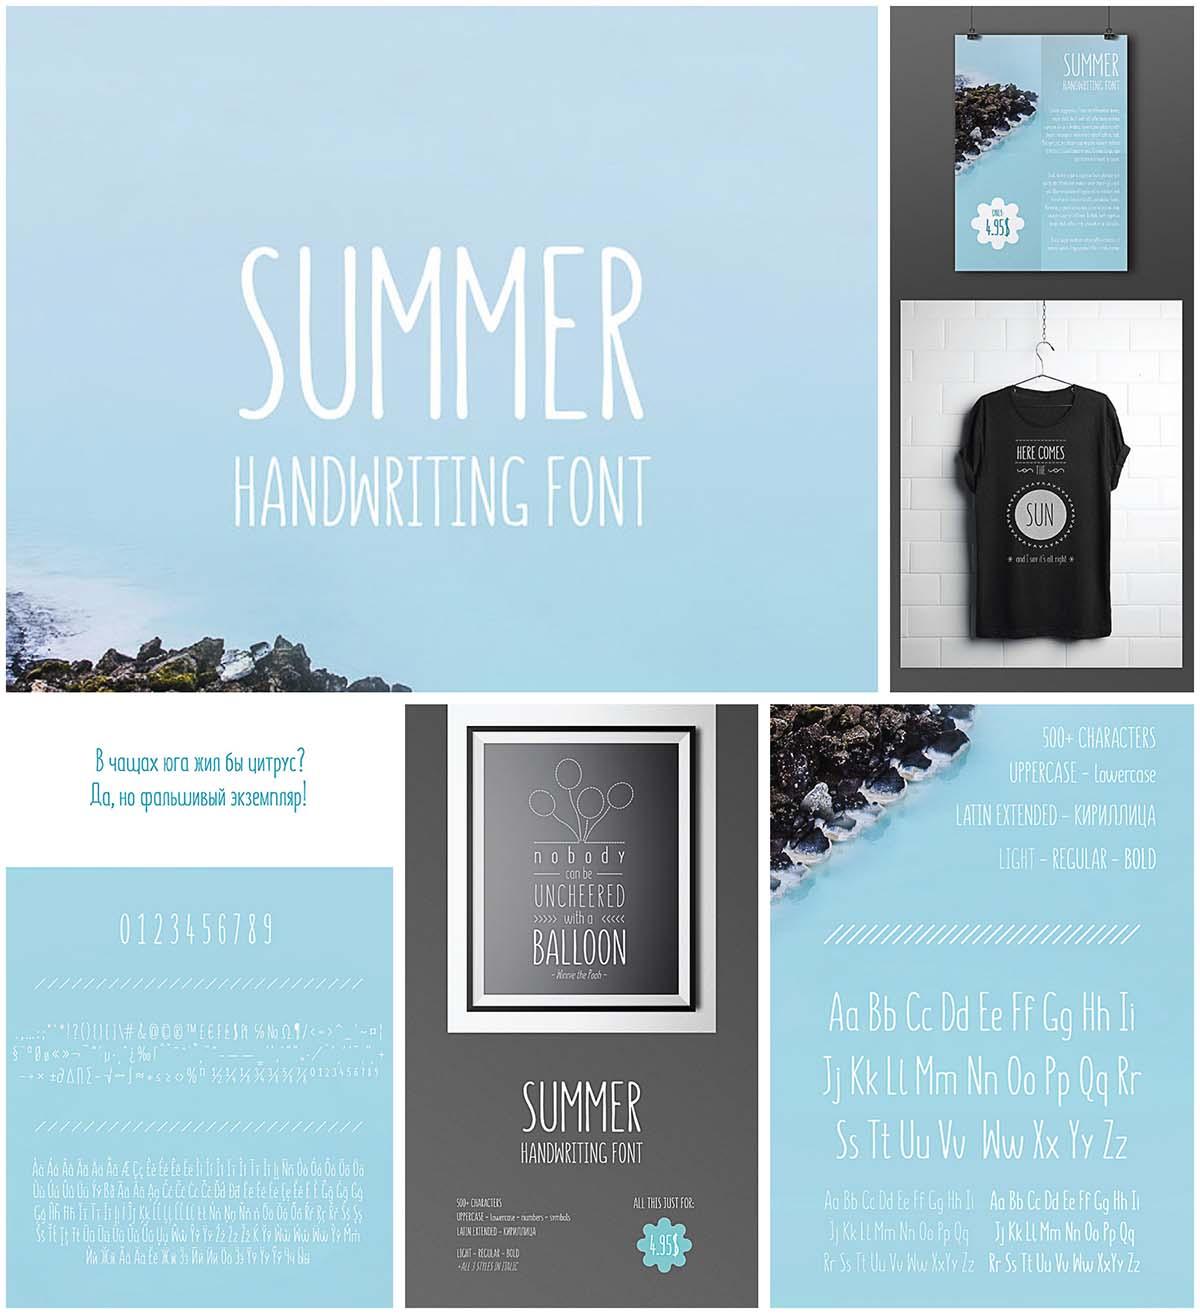 Summer cyrillic font